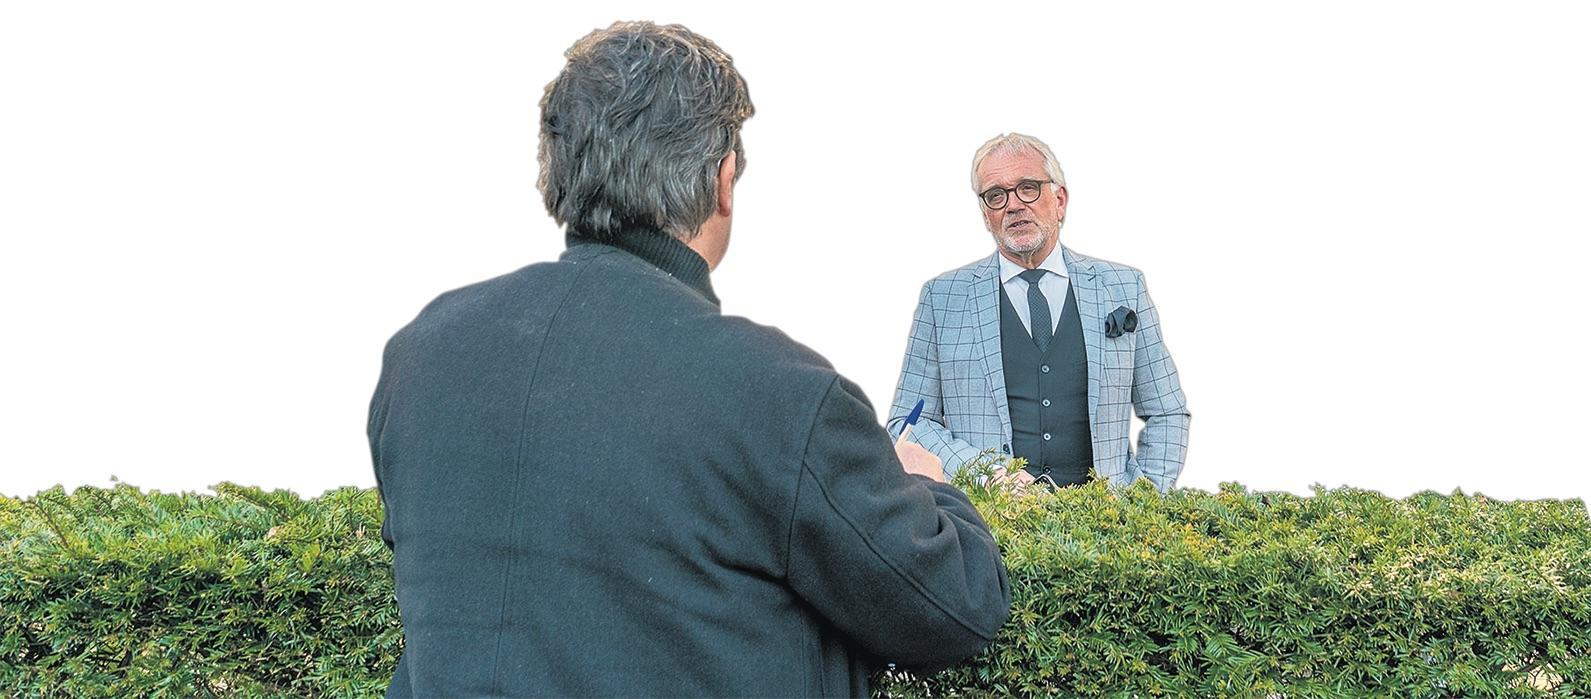 Burgemeester van Alkmaar platgebeld over wat nu vanaf volgende week wel en niet mag